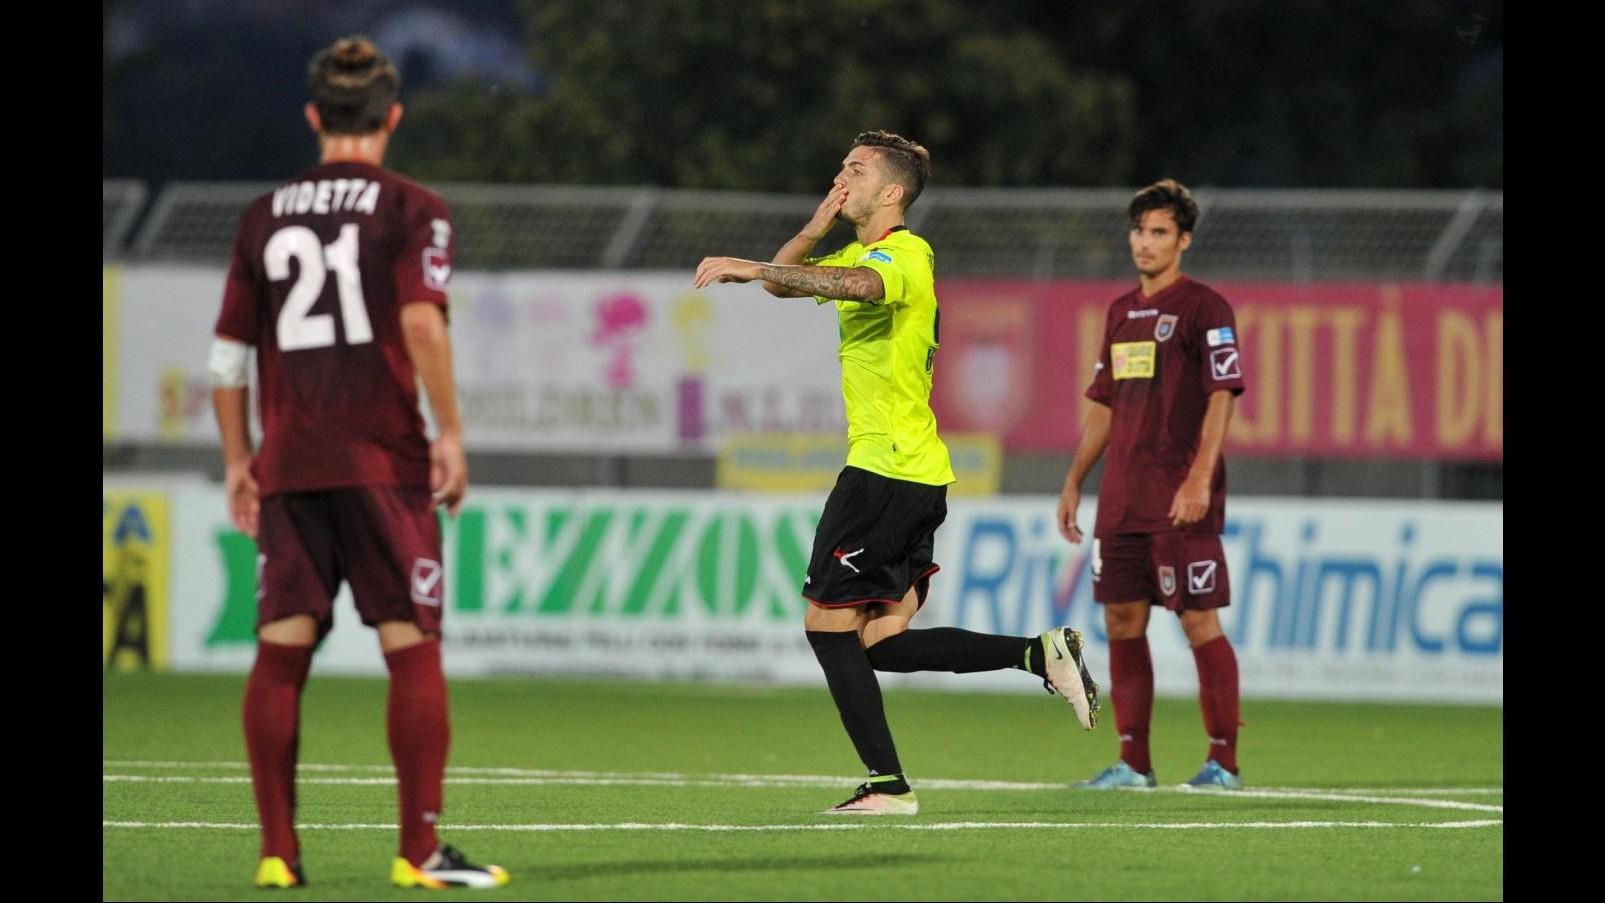 Lega Pro, Pontedera sconfitta 2-4 dalla Lucchese